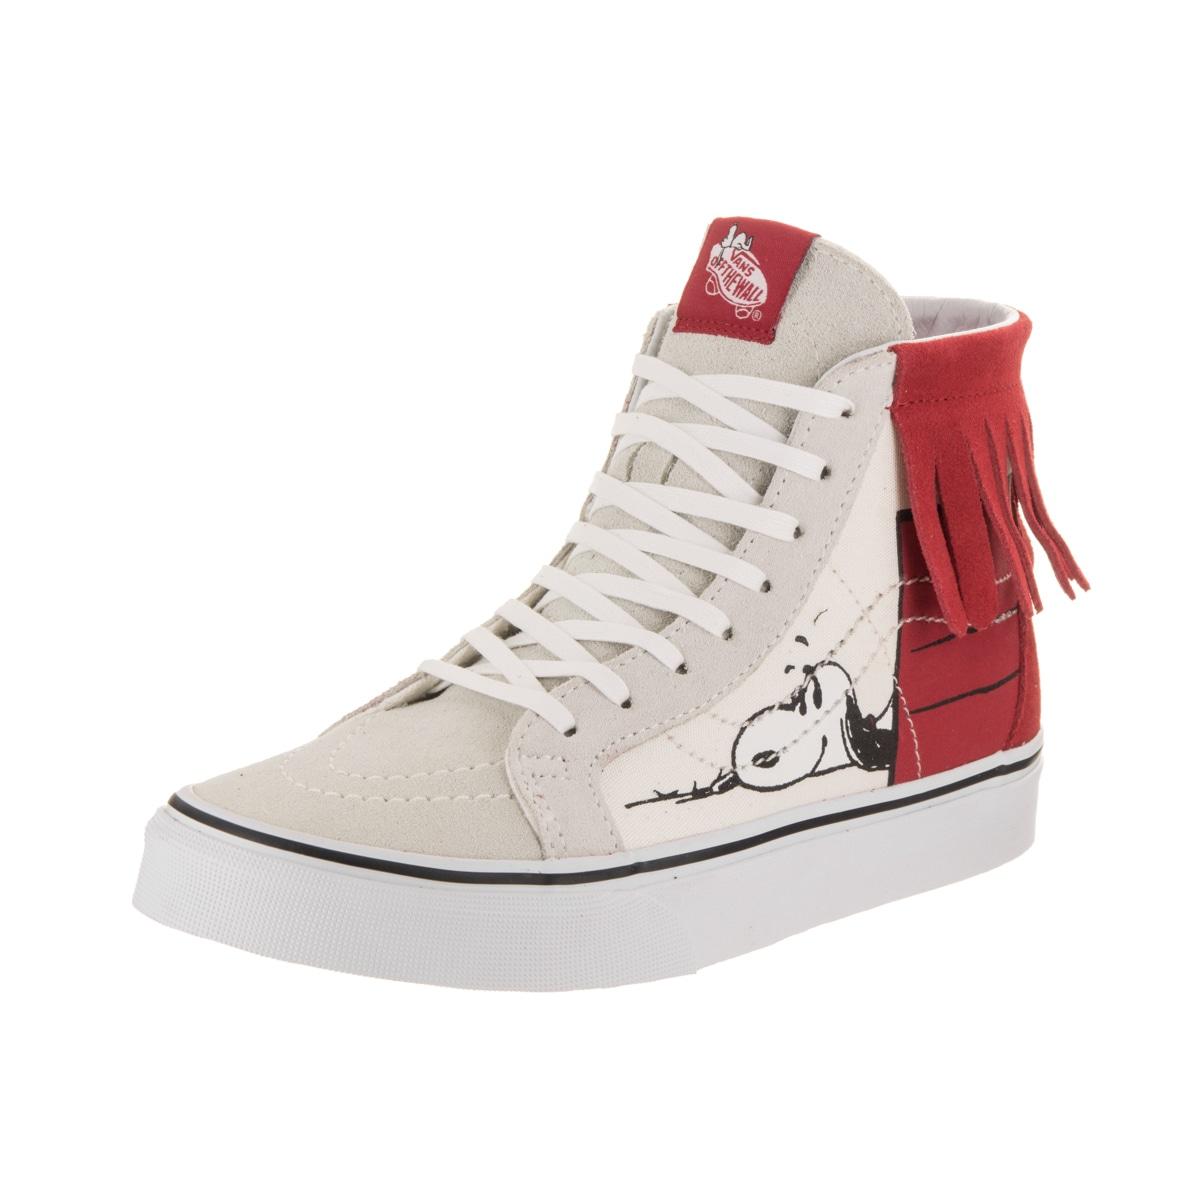 cb63021a91 Shop Vans Unisex Sk8-Hi Moc (Peanuts) Skate Shoe - Free Shipping Today -  Overstock - 16342803